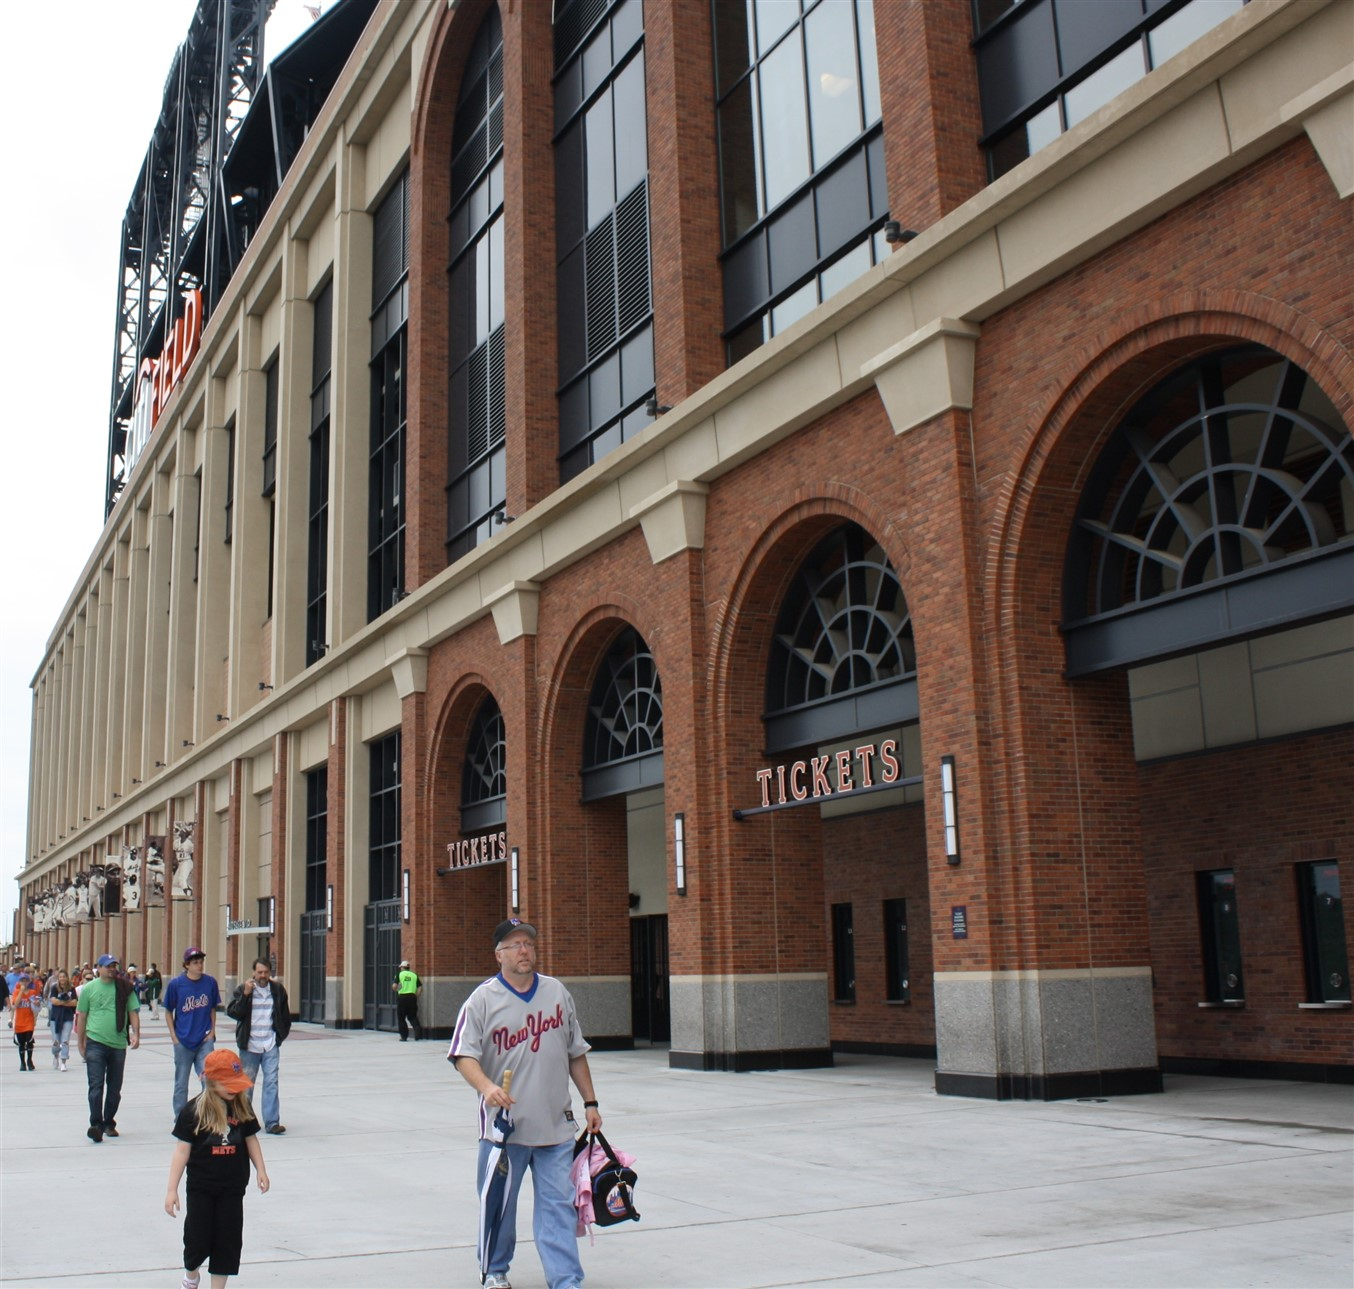 2009 06 21 Law School Road Trip Day 6 New York Mets 35.jpg